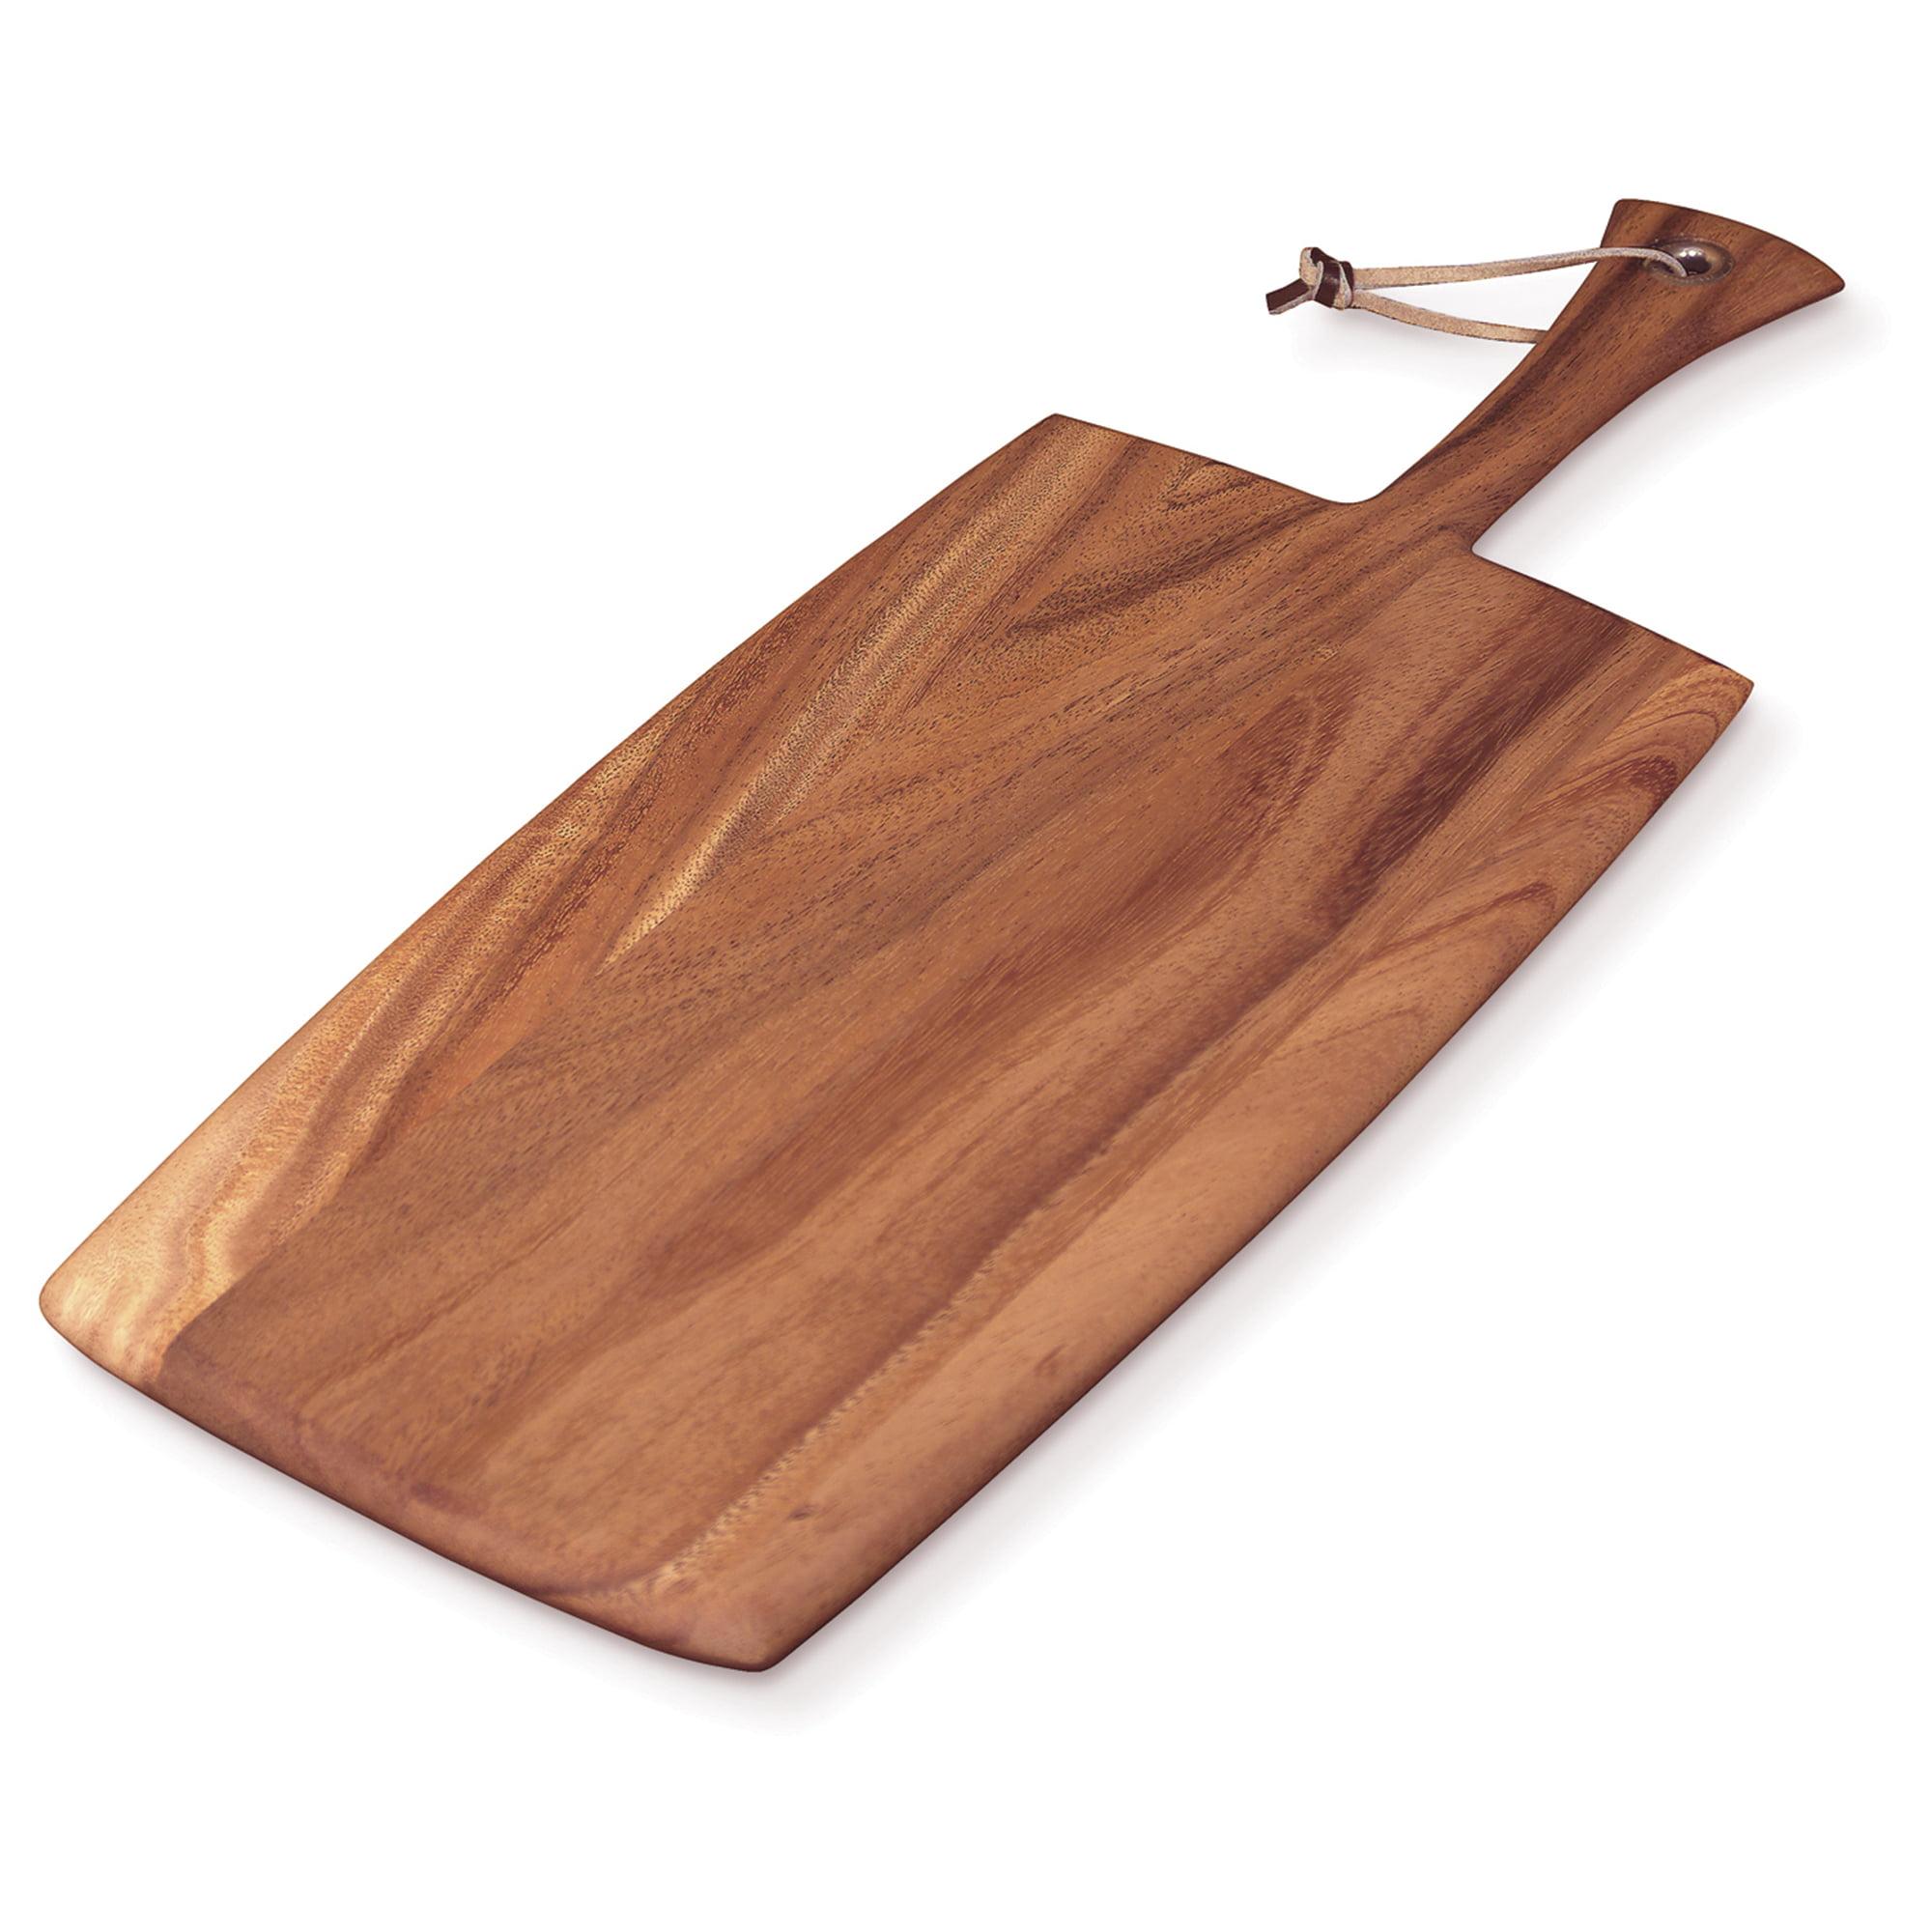 Large Rectangular Paddle Board, Acacia Wood by Fox Run Brands